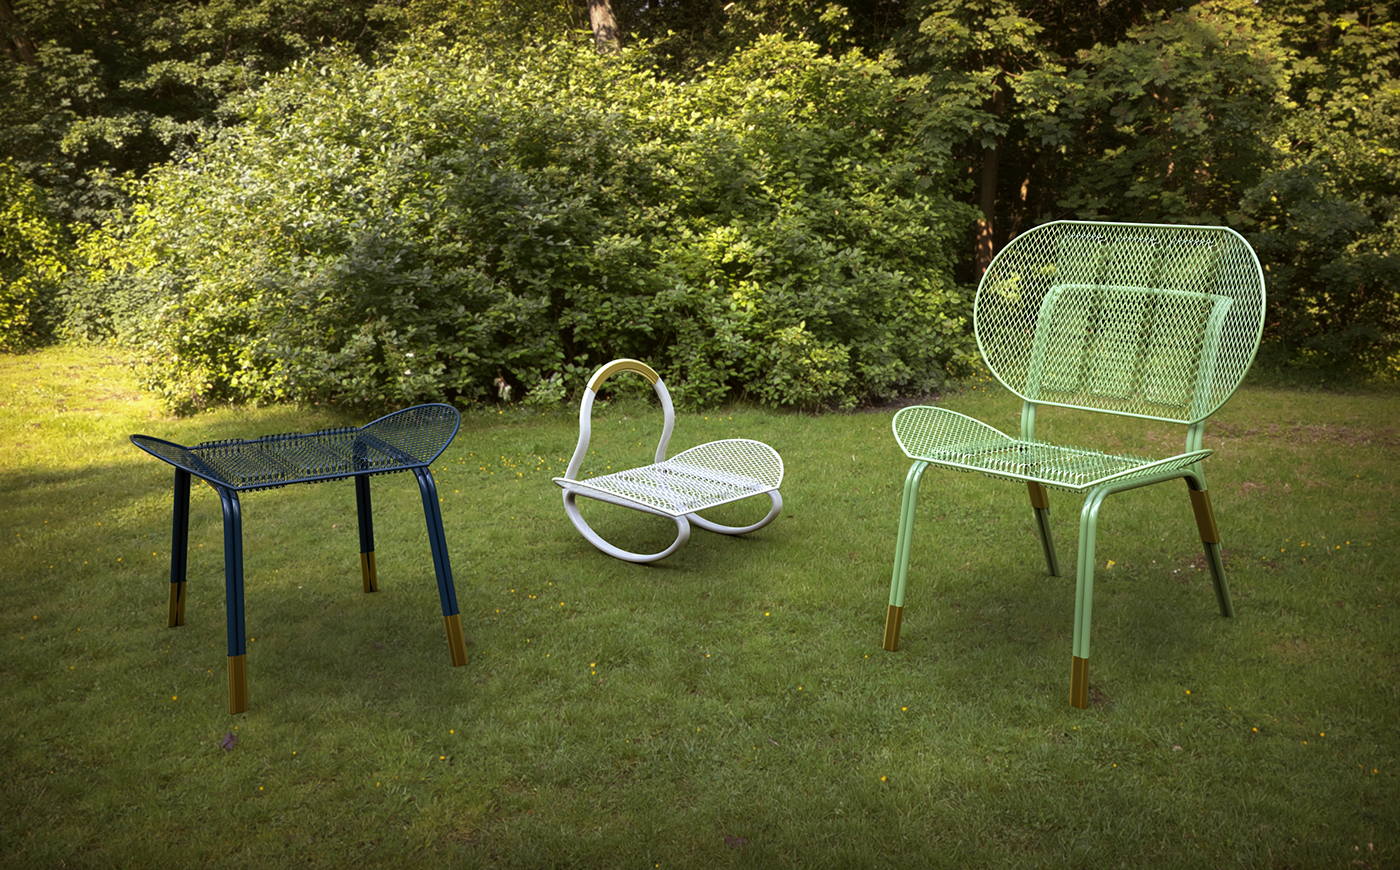 furniture garden metal steel mesh Garden Furniture expanded mesh